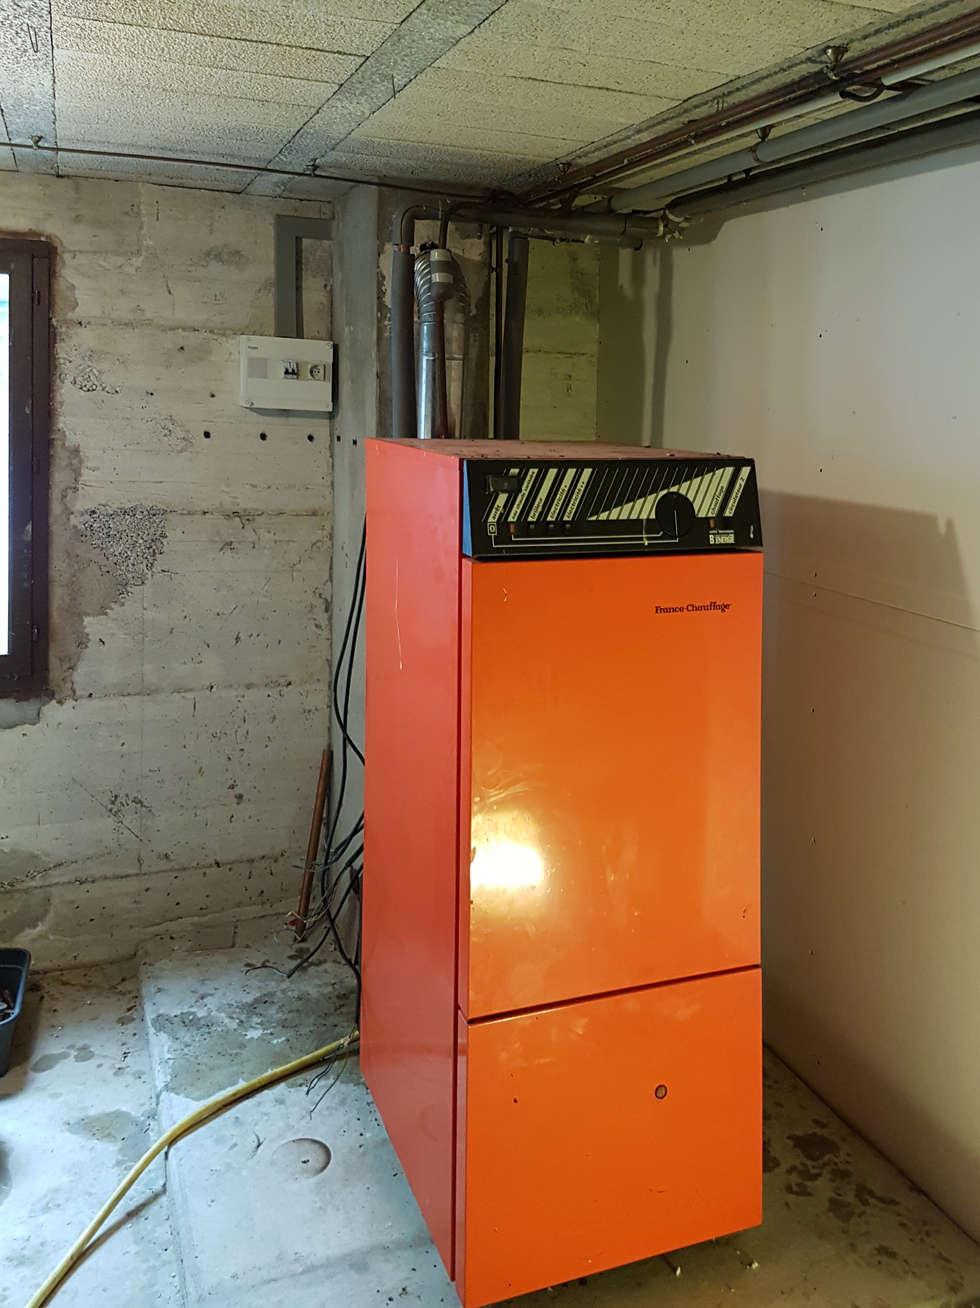 remplacer chaudiere fioul cheap hqlj biomasse brleur. Black Bedroom Furniture Sets. Home Design Ideas